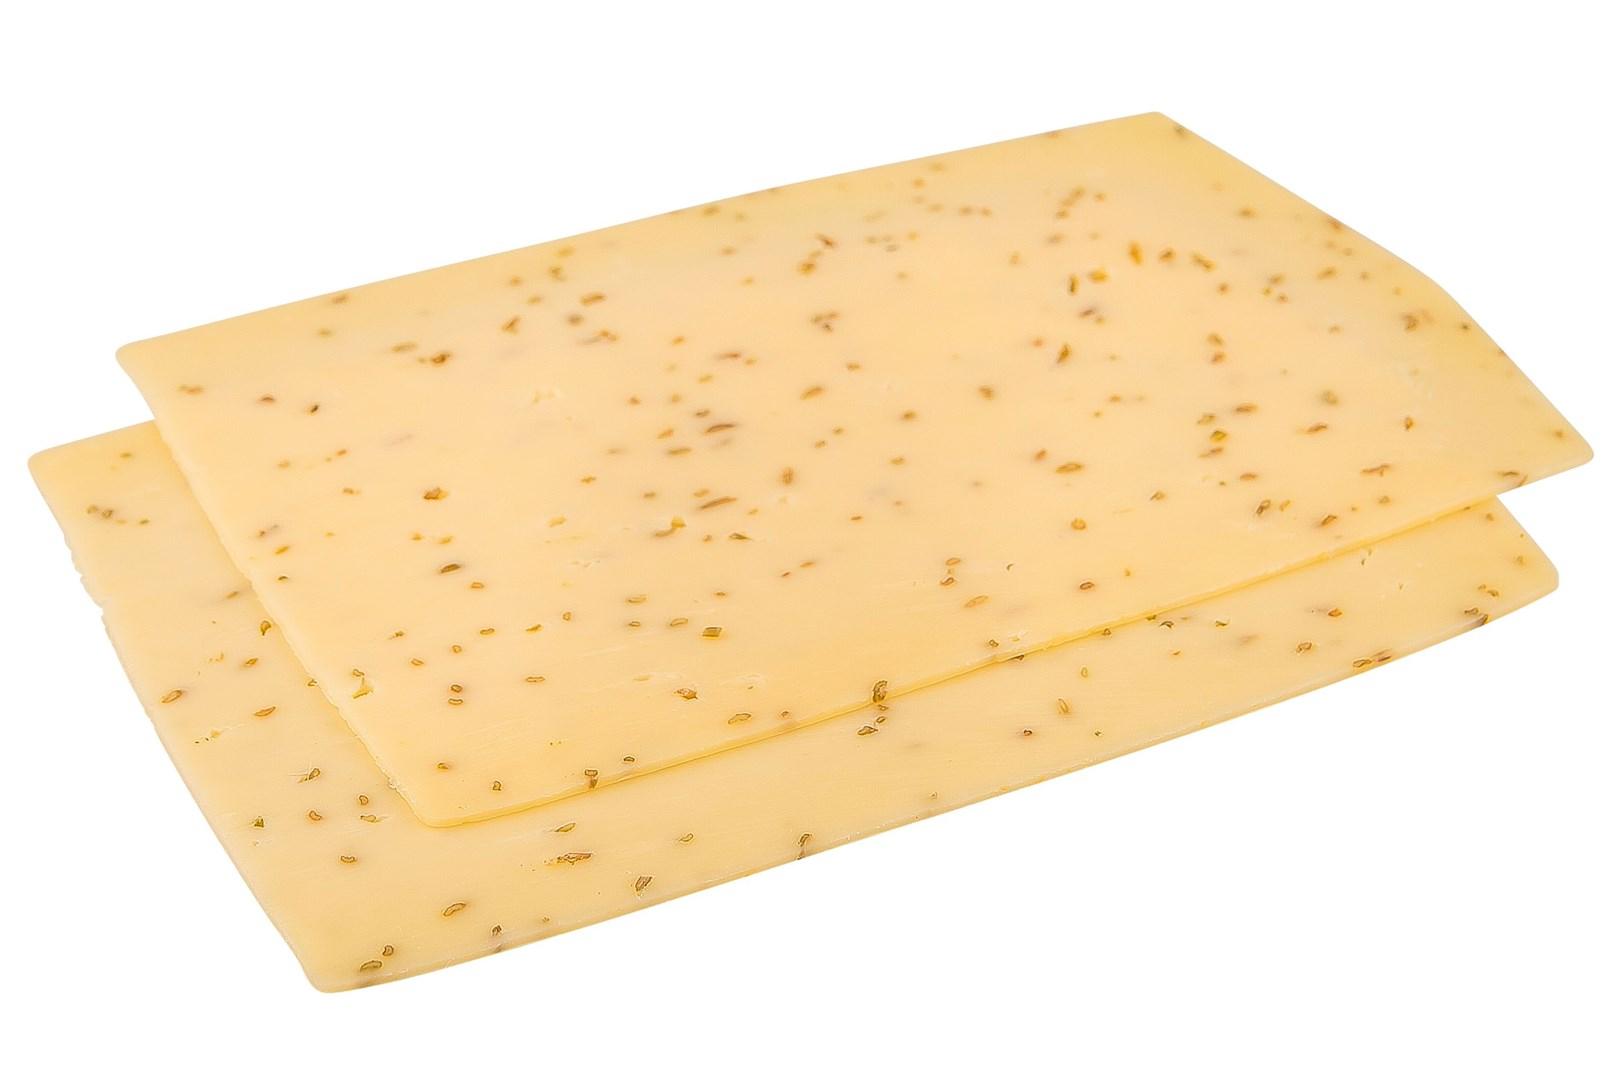 Productafbeelding Houtenaer komijnen kaas 48+ 5x2pl